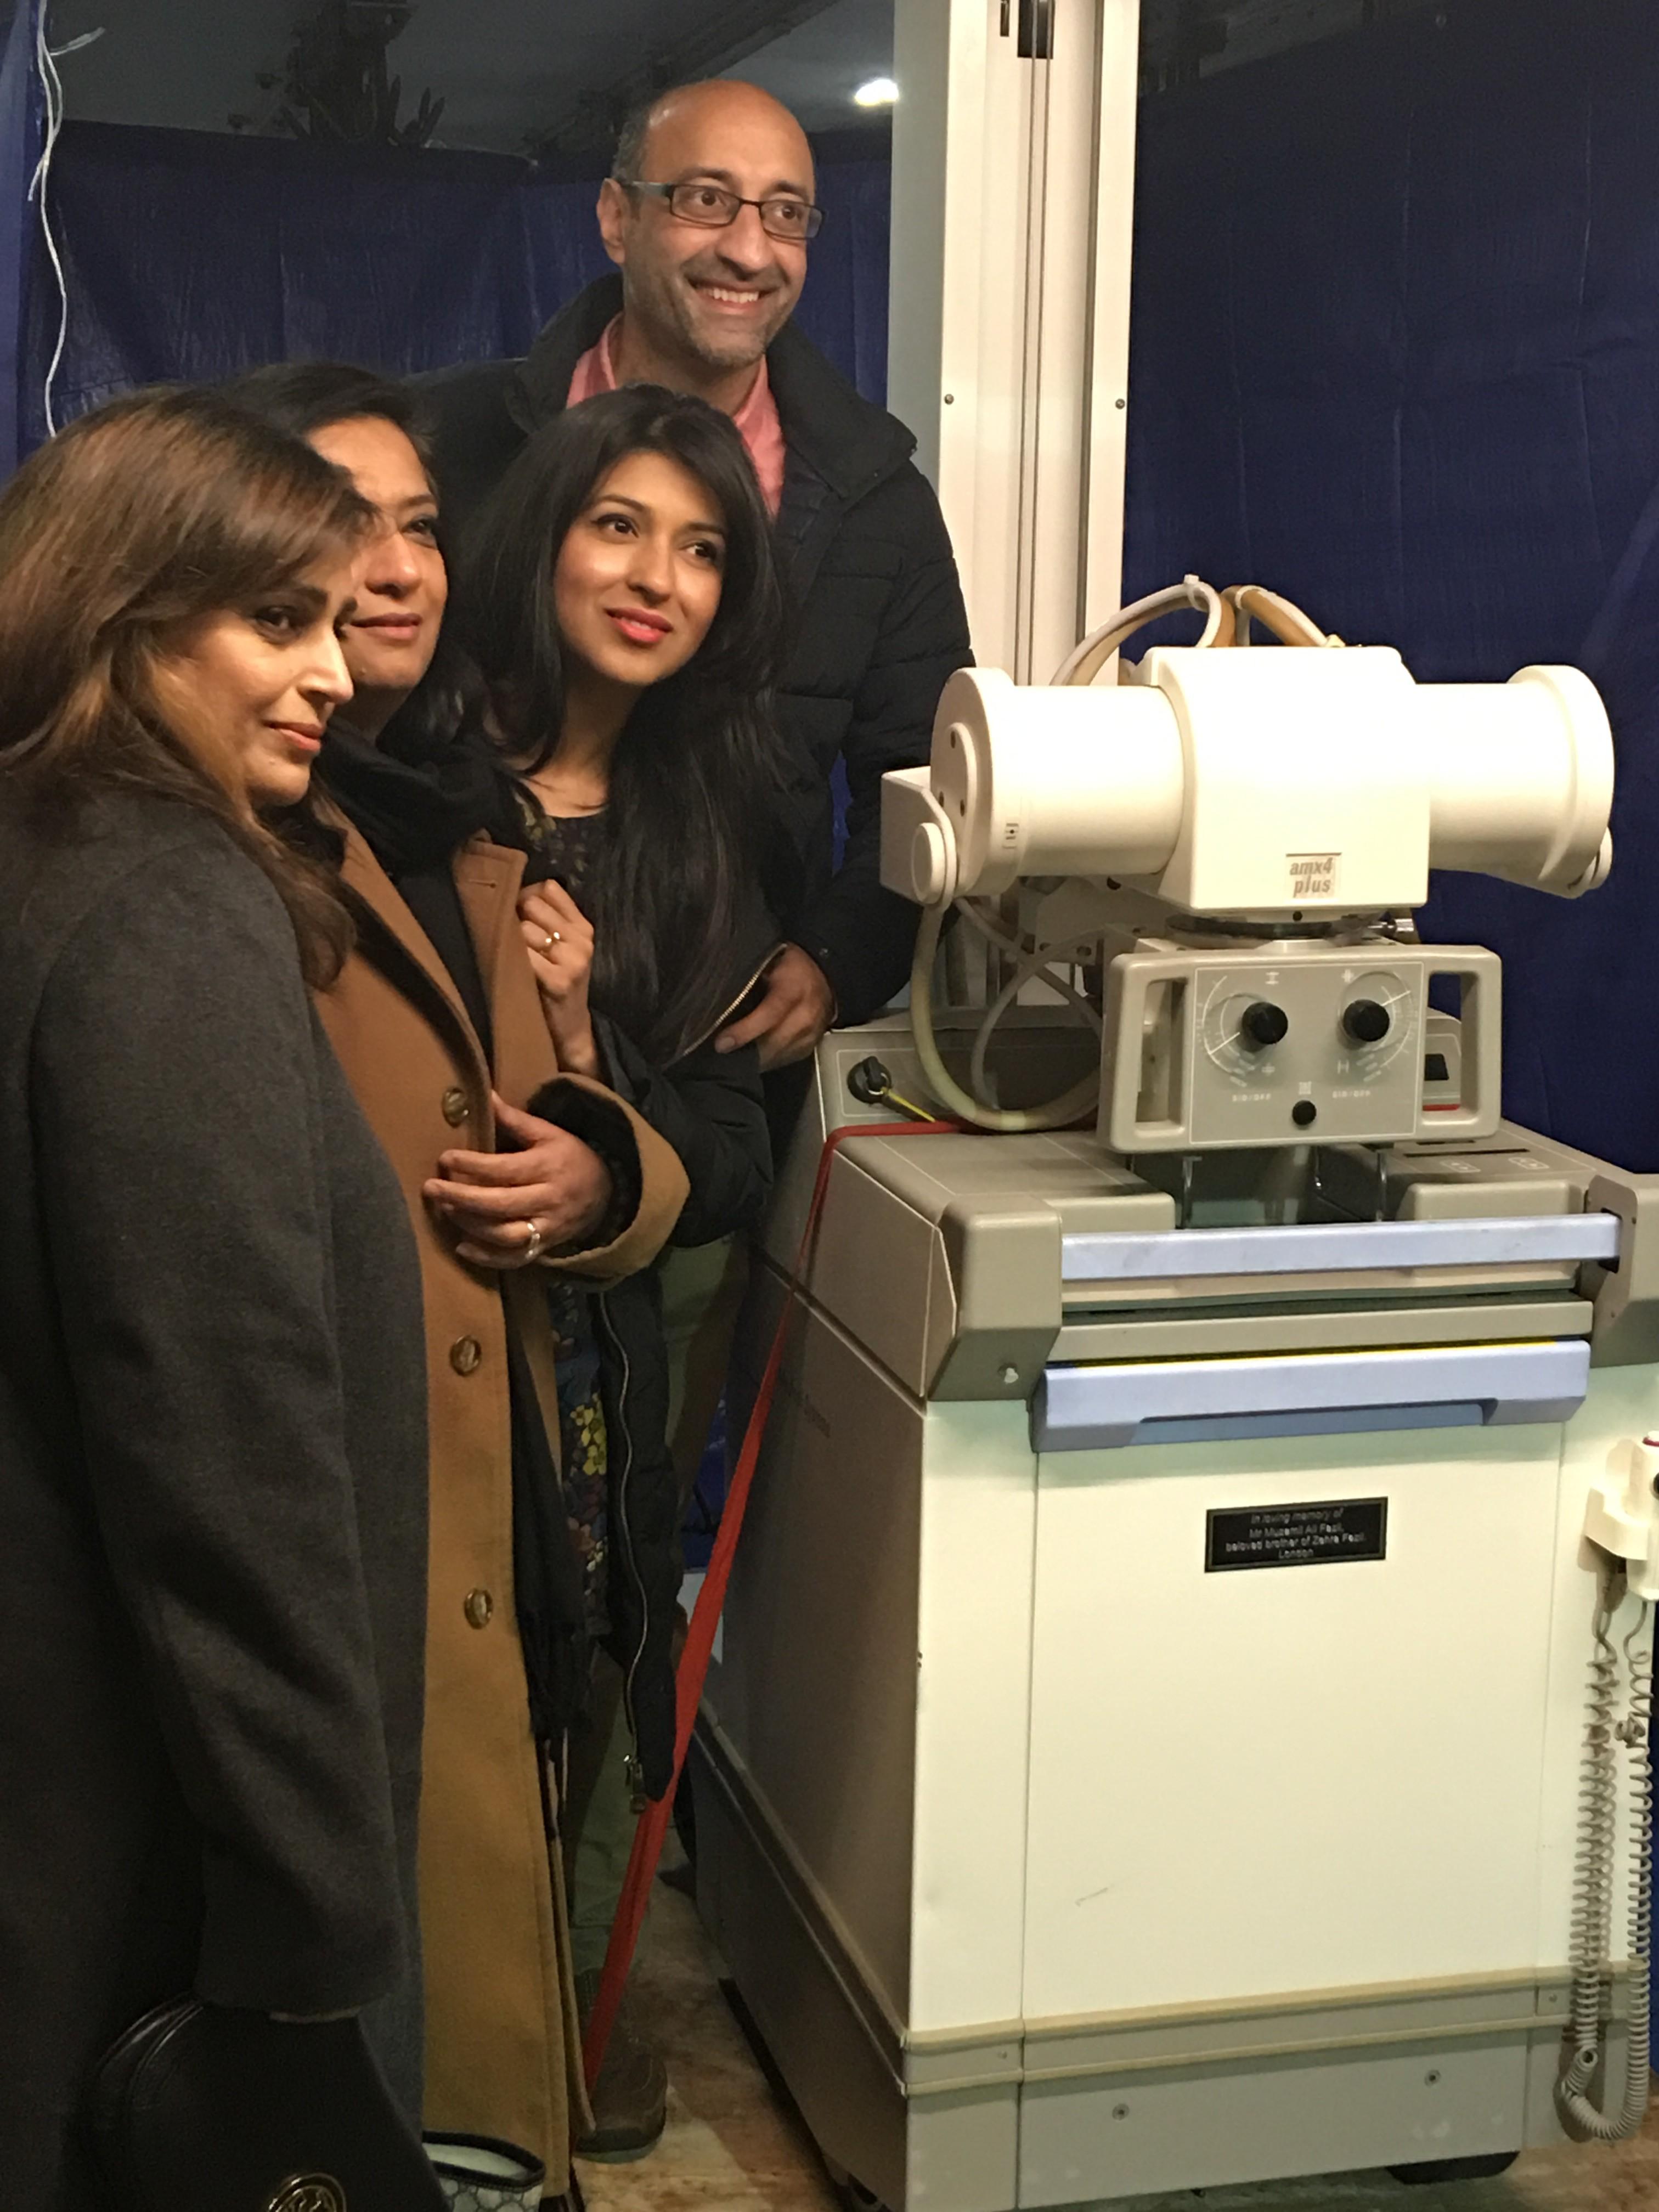 From  L-R: Zehra Dar, Zehra Fazil, Mufaza Rashid, Asrar Rashid